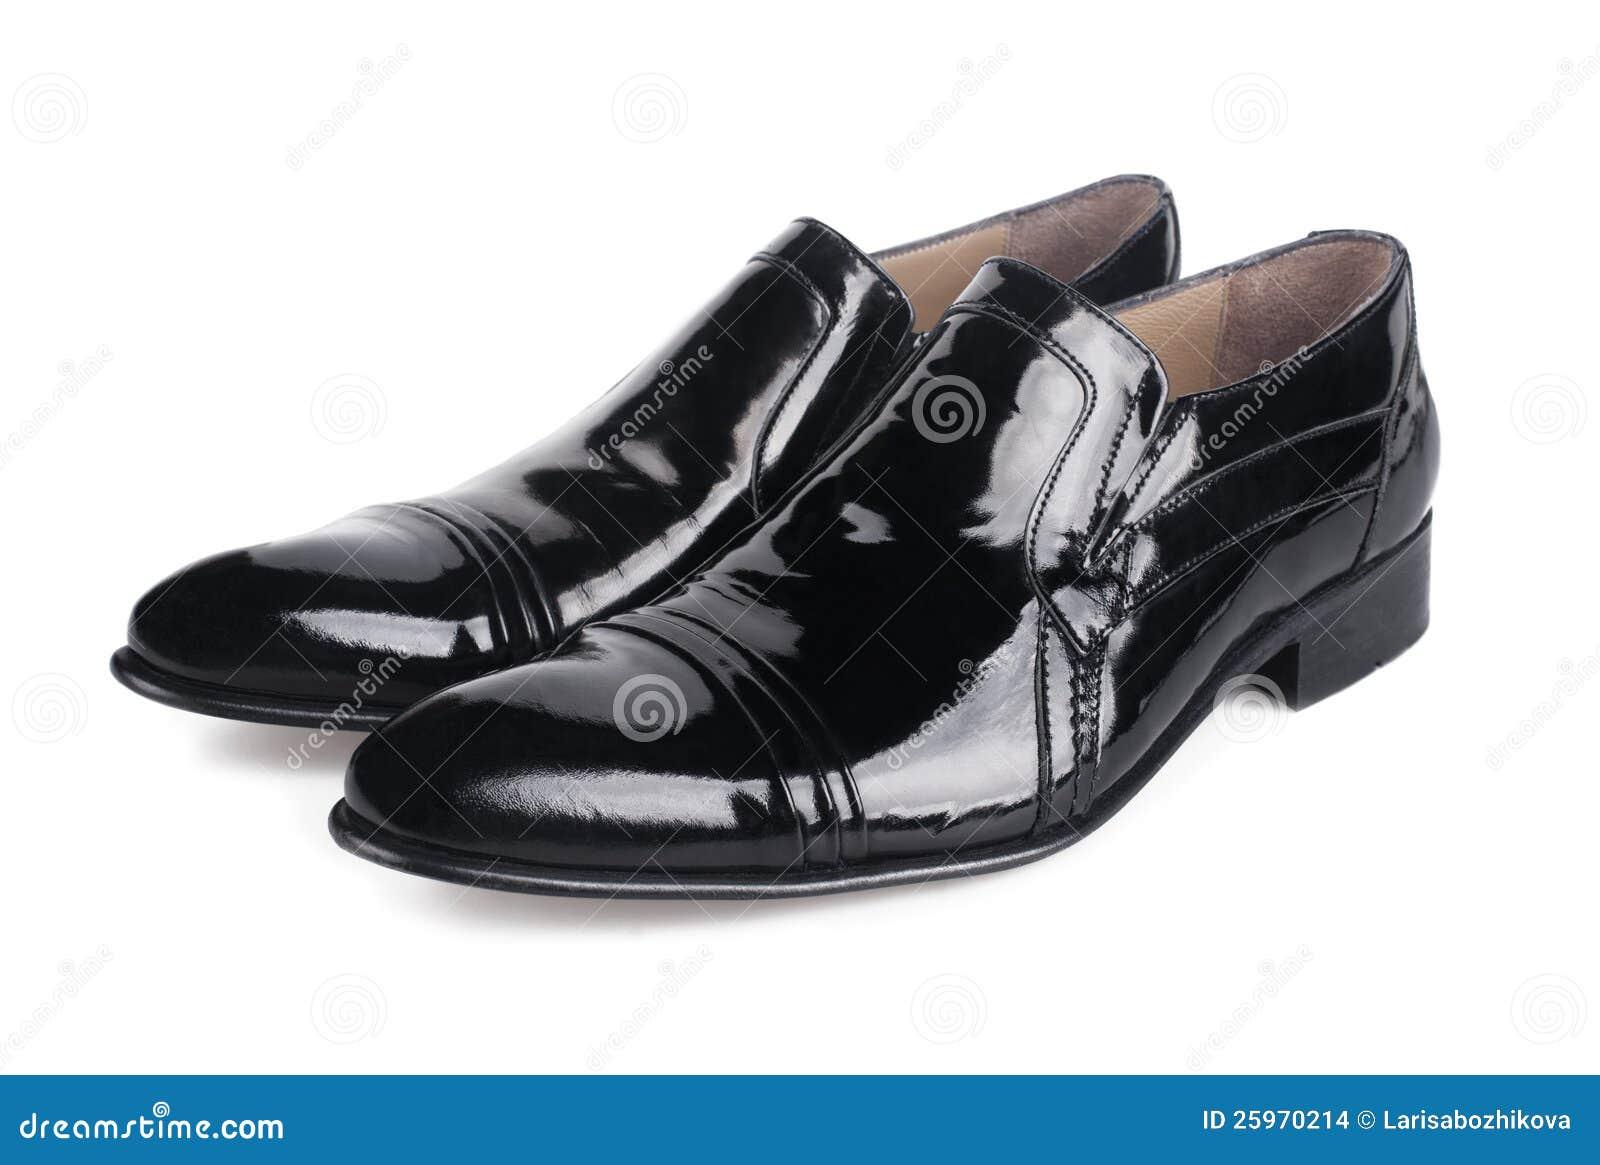 Polished Black Mens Shoes Stock Images - Image: 25970214